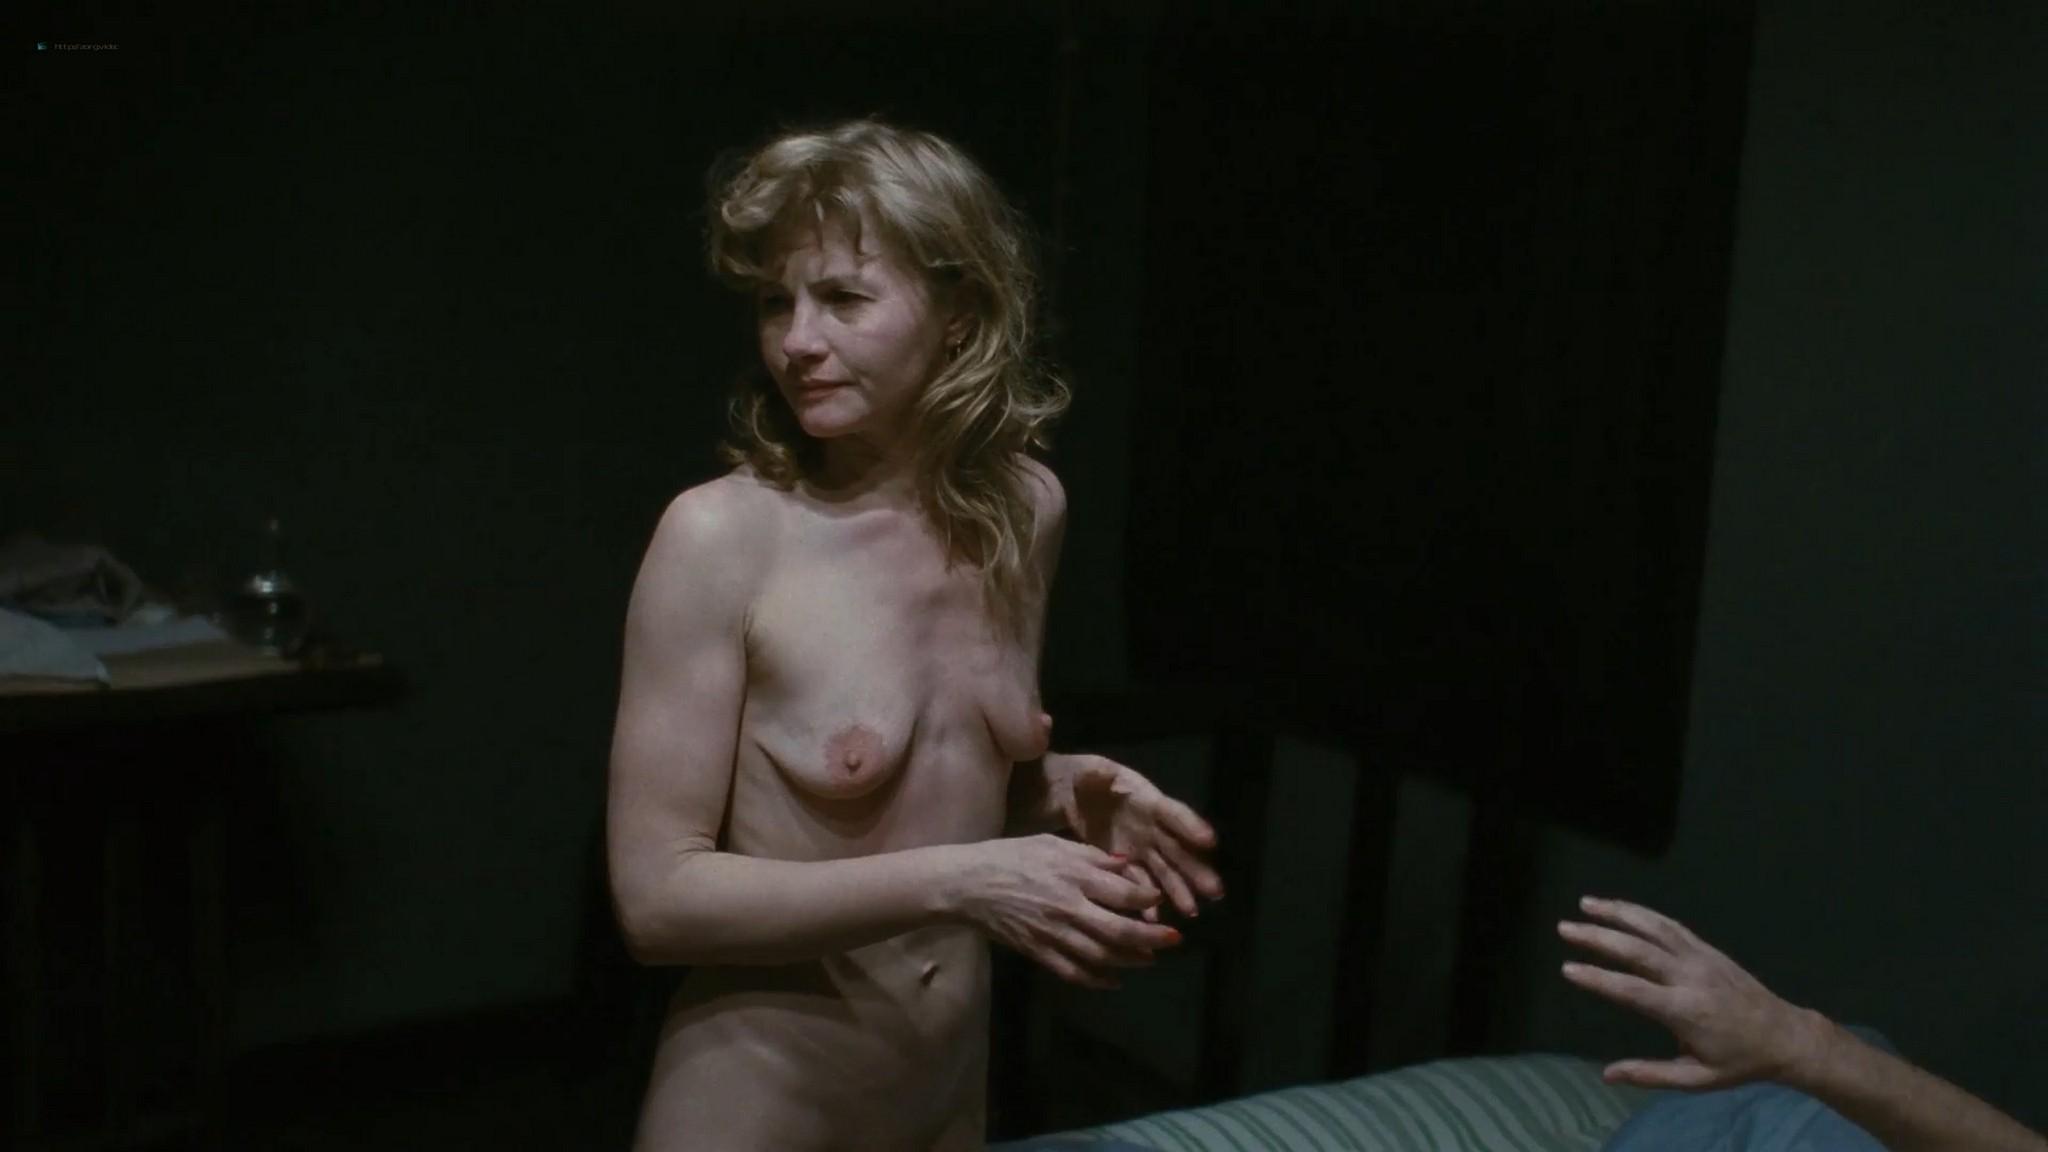 Olga Shkabarnya nude Natalia Berezhnaya nude explicit sex - DAU Natasha (2020) HD 1080p Web (14)